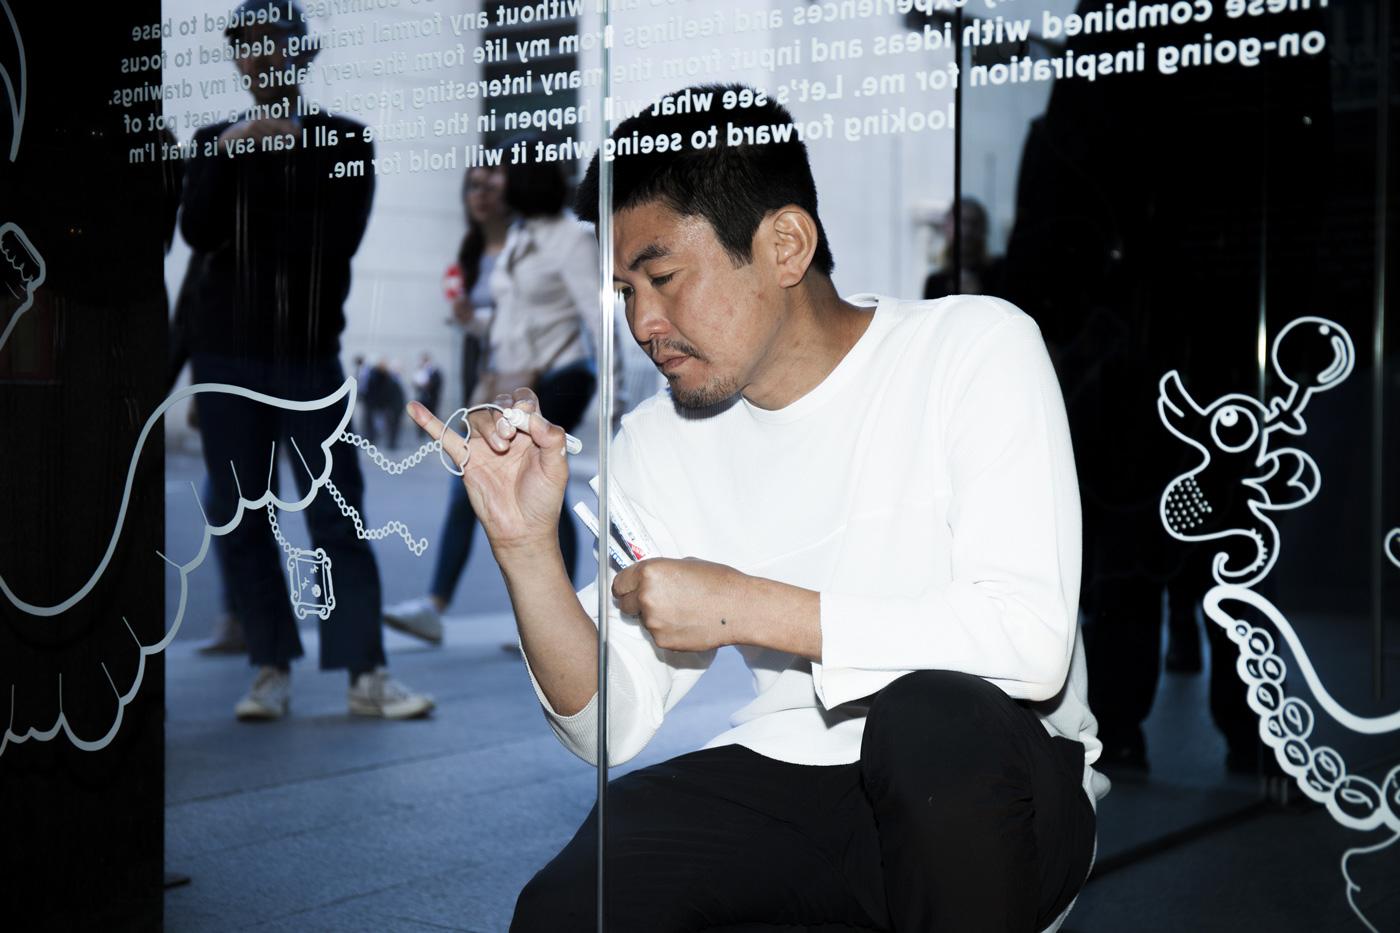 Yoshi Sislay dibujando en la cristalera del Hotel Urban